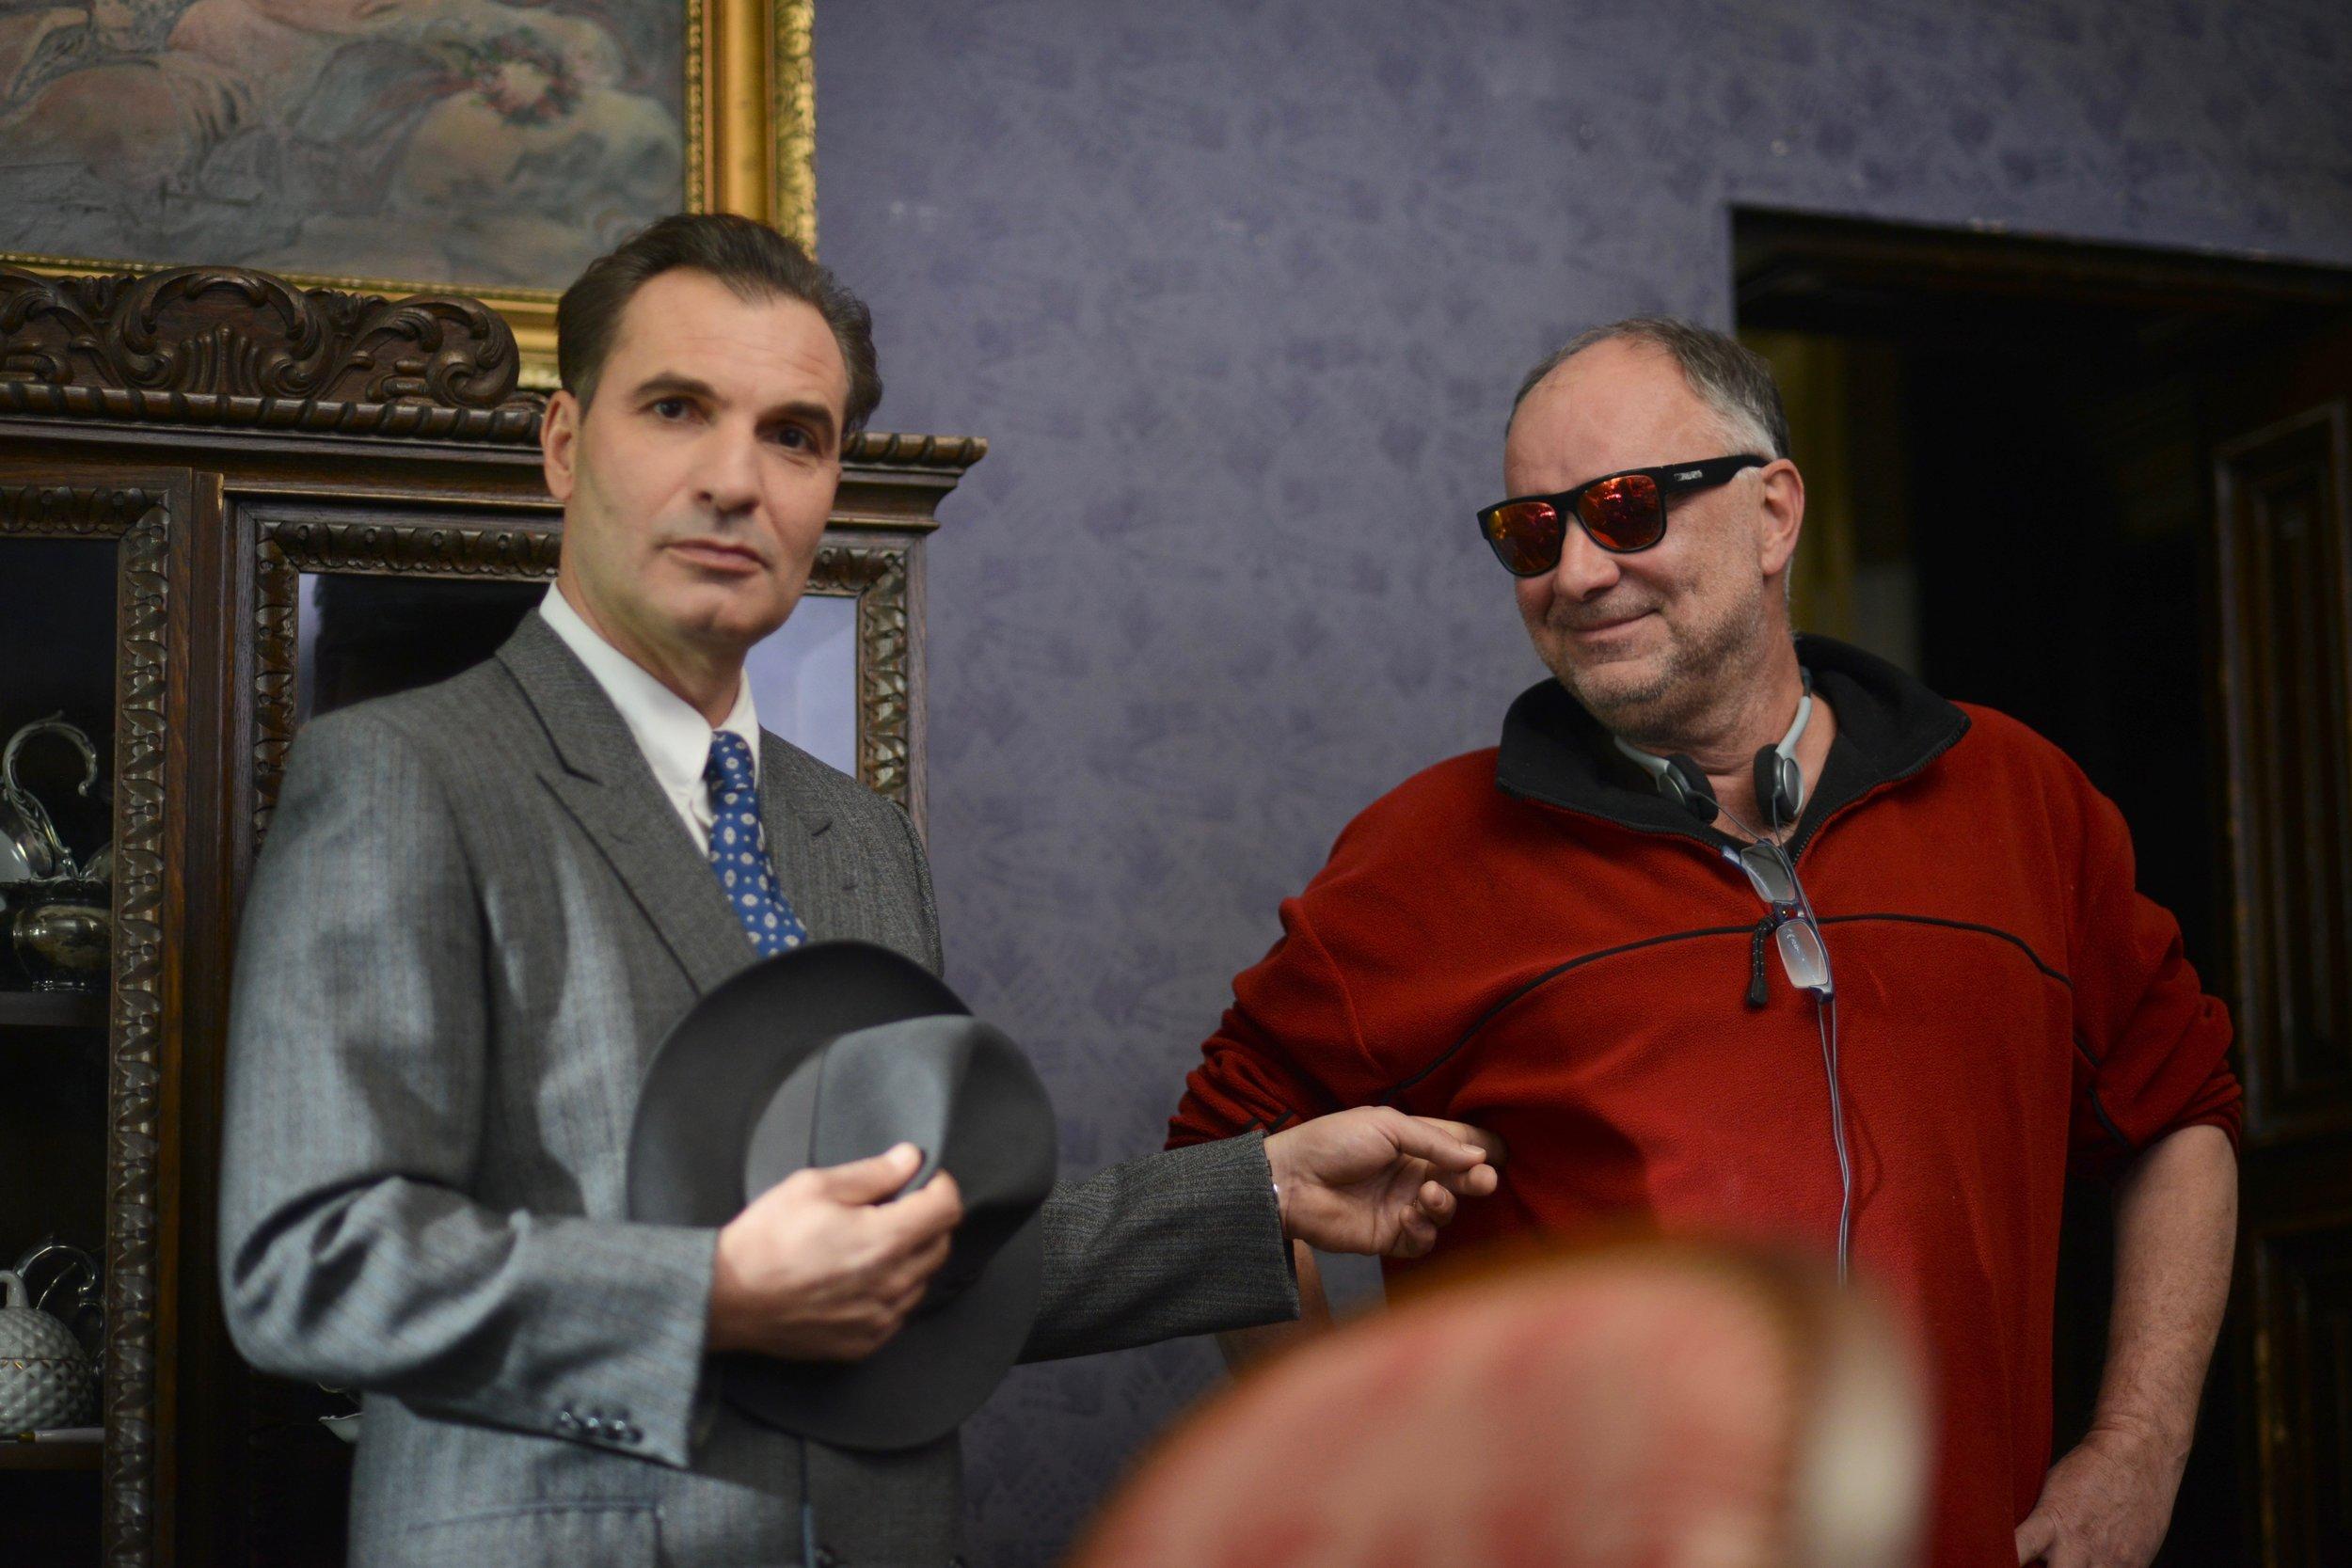 Jiří Macháček a režisér Ondřej Trojan FOTO Bára Lockefeer.jpg